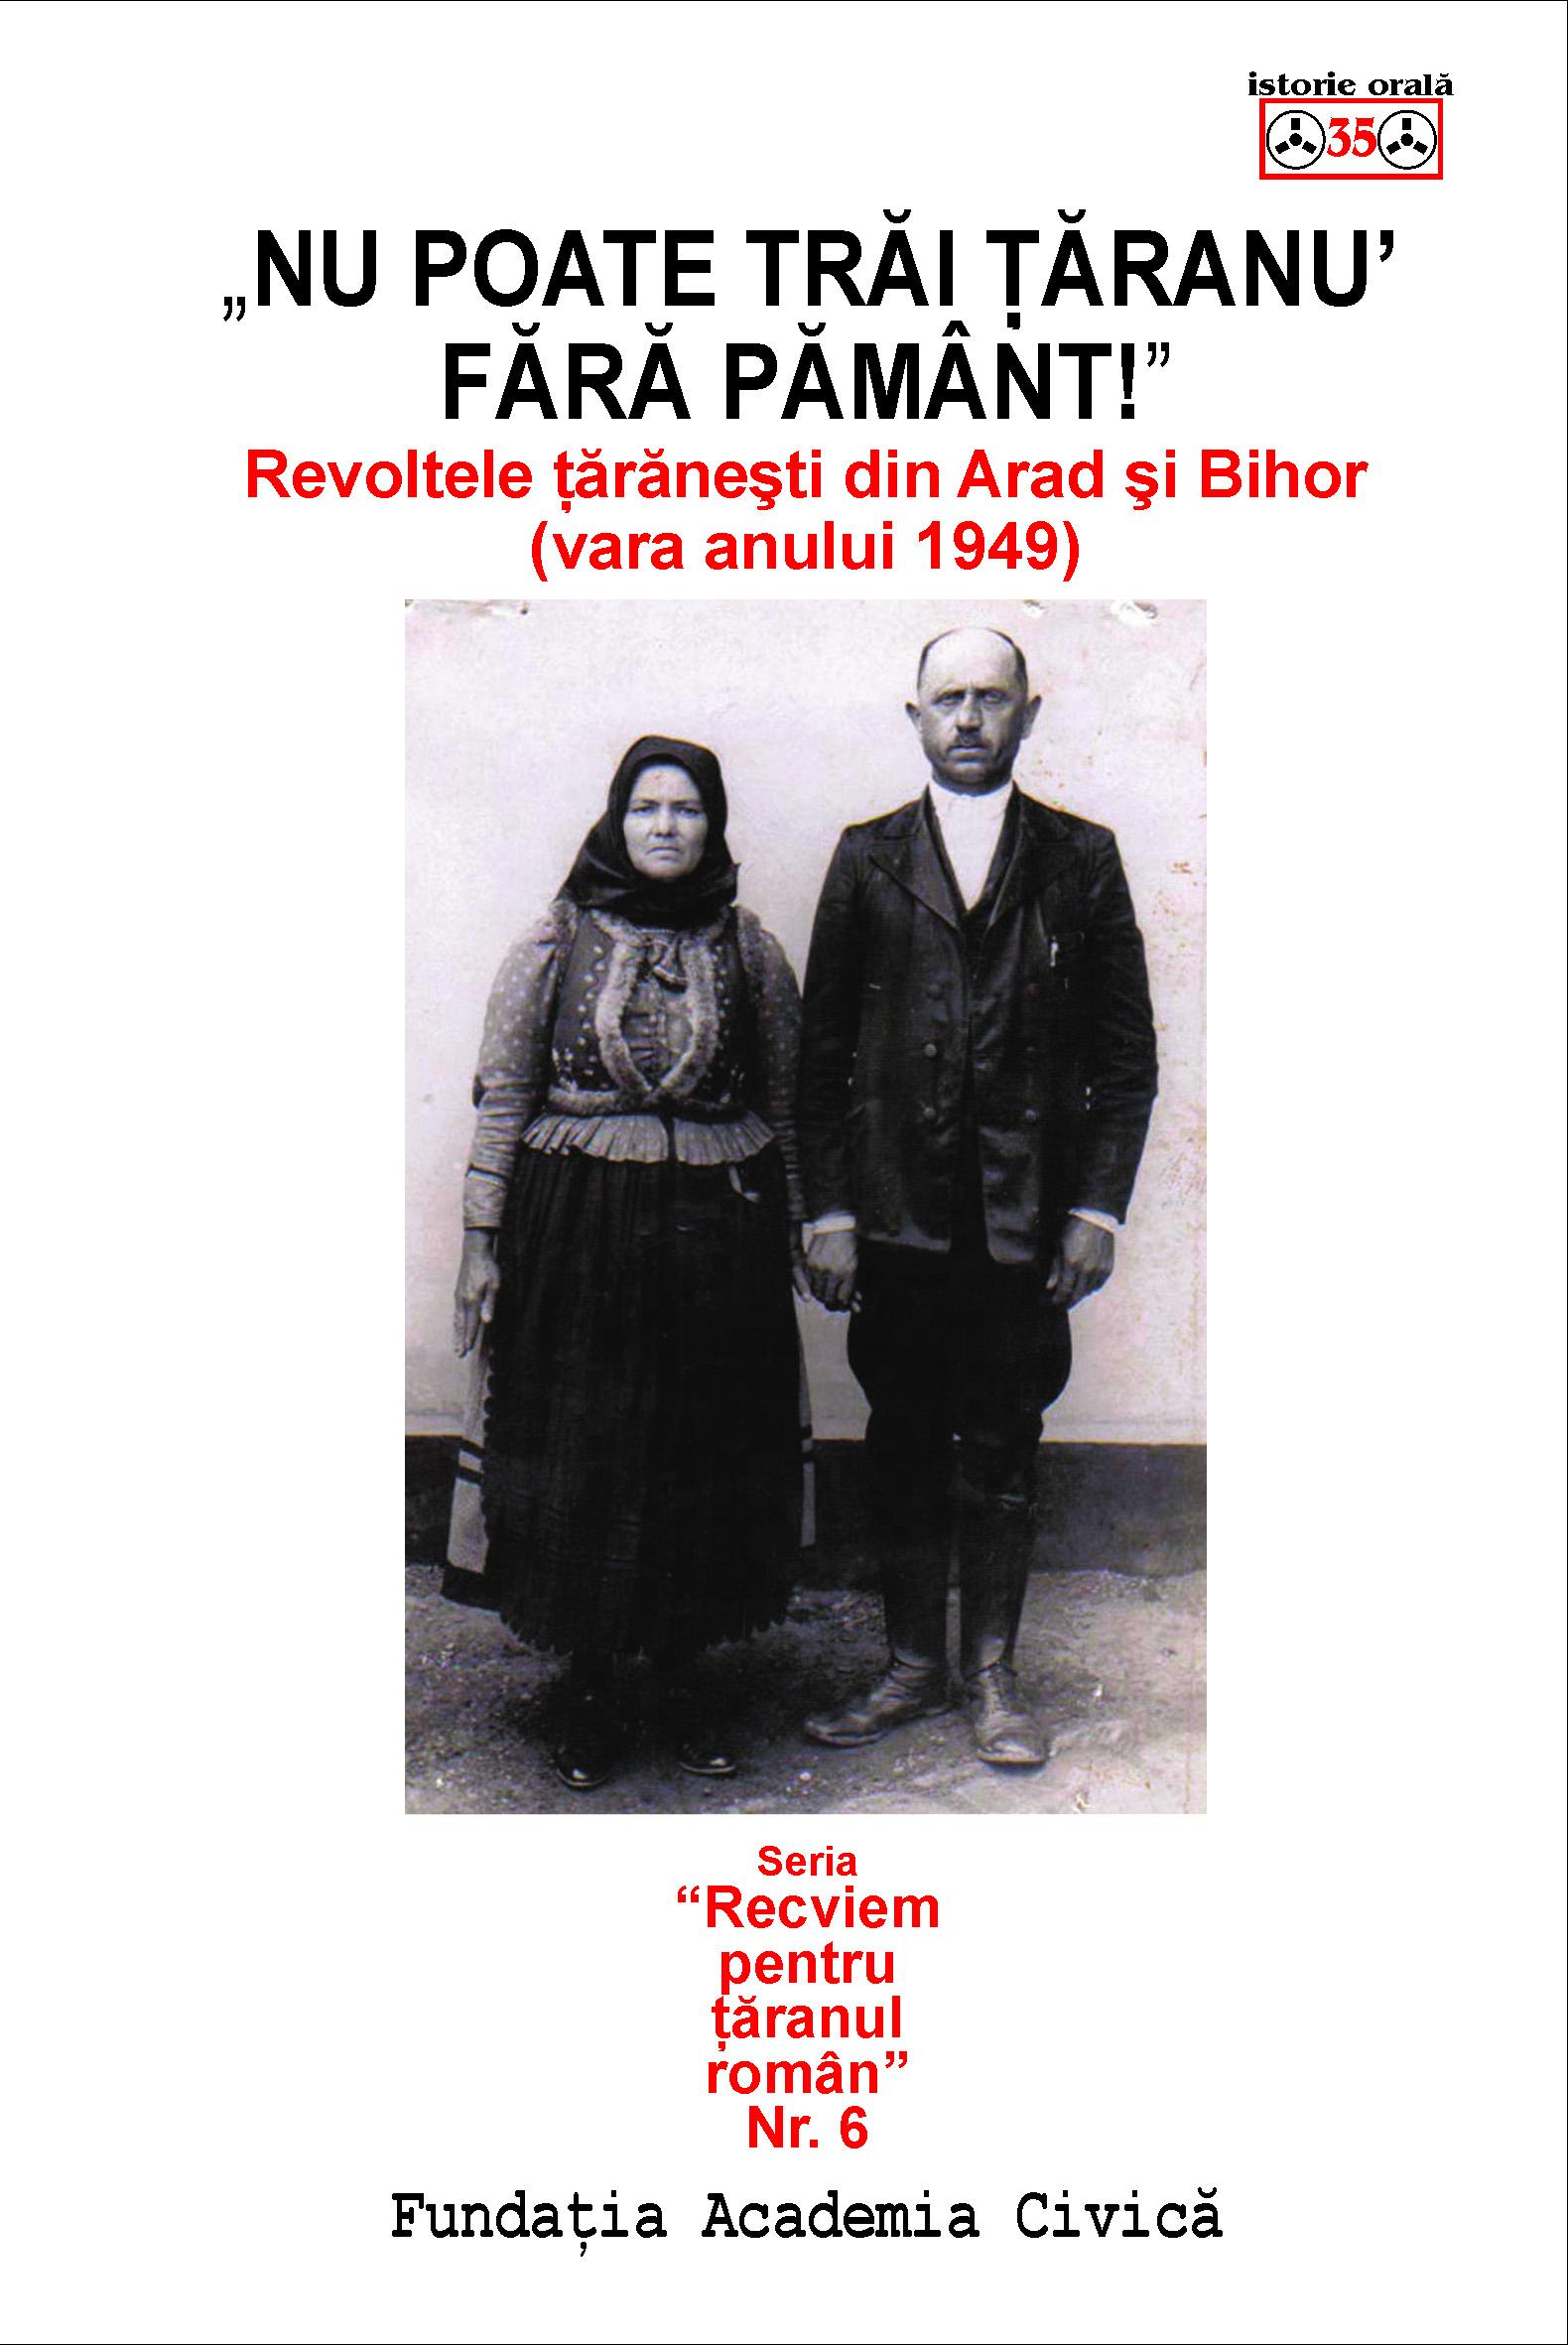 """Nu poate trai taranu' fara pamant!"". Revoltele taranesti din Arad si Bihor (vara anului 1949)"